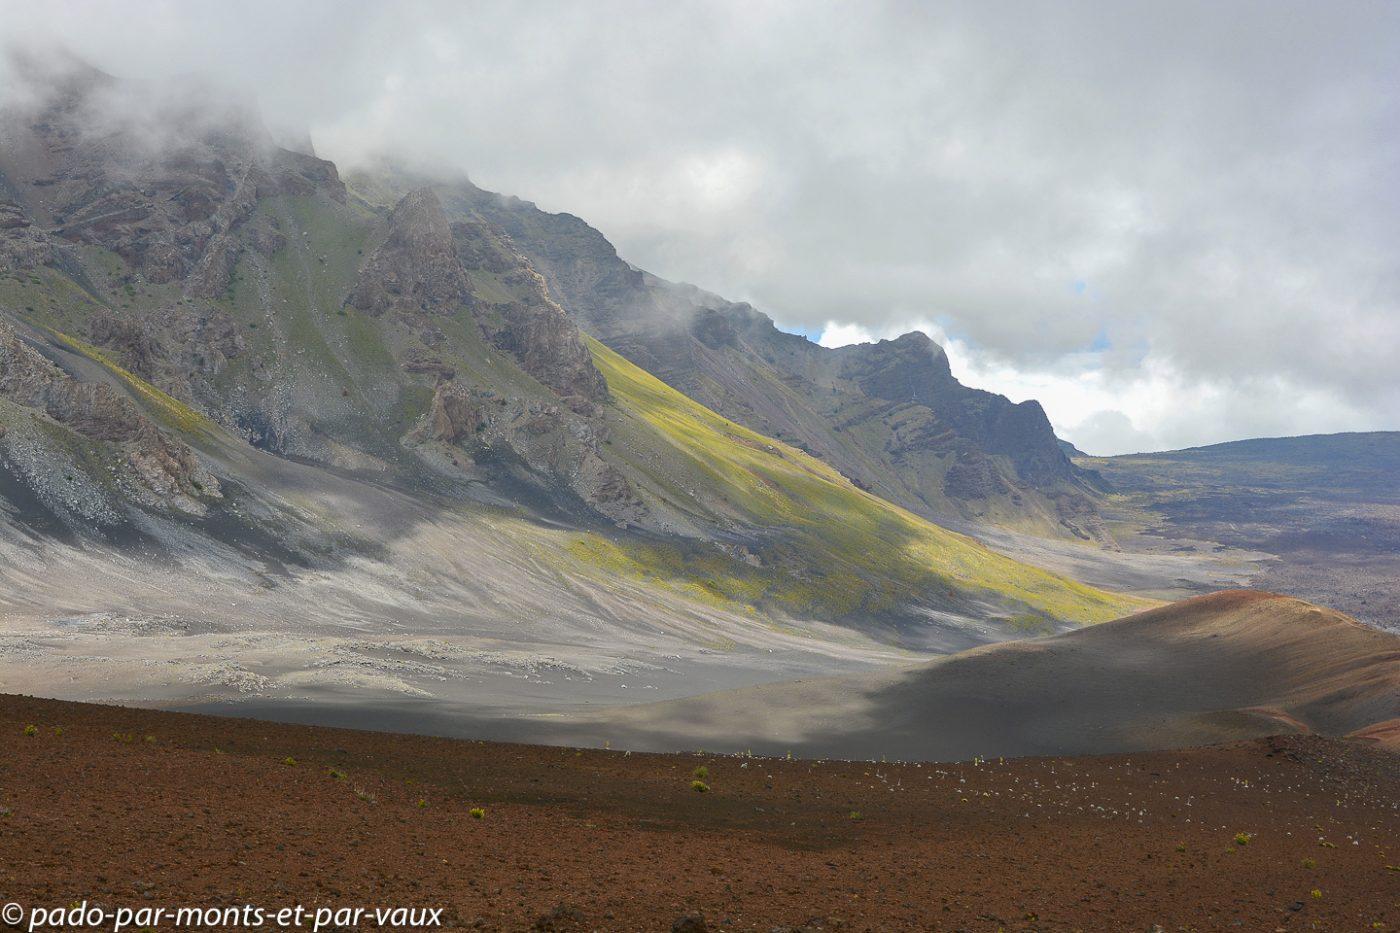 Maui  - Haleakala national park - sliding sands trail